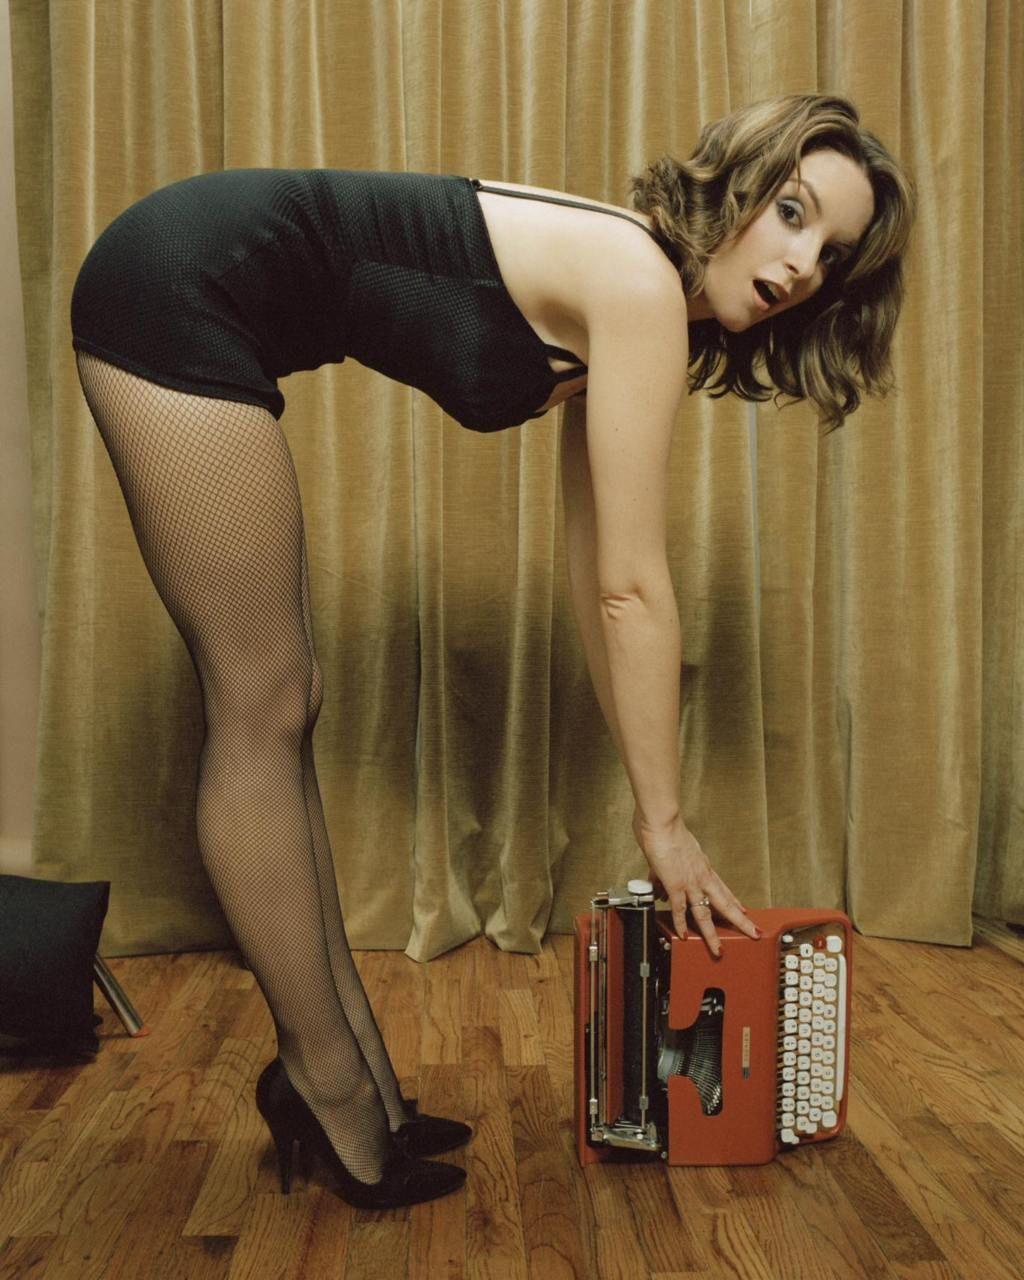 Dana Hamm sexy photos. 2018-2019 celebrityes photos leaks! nude (47 image)